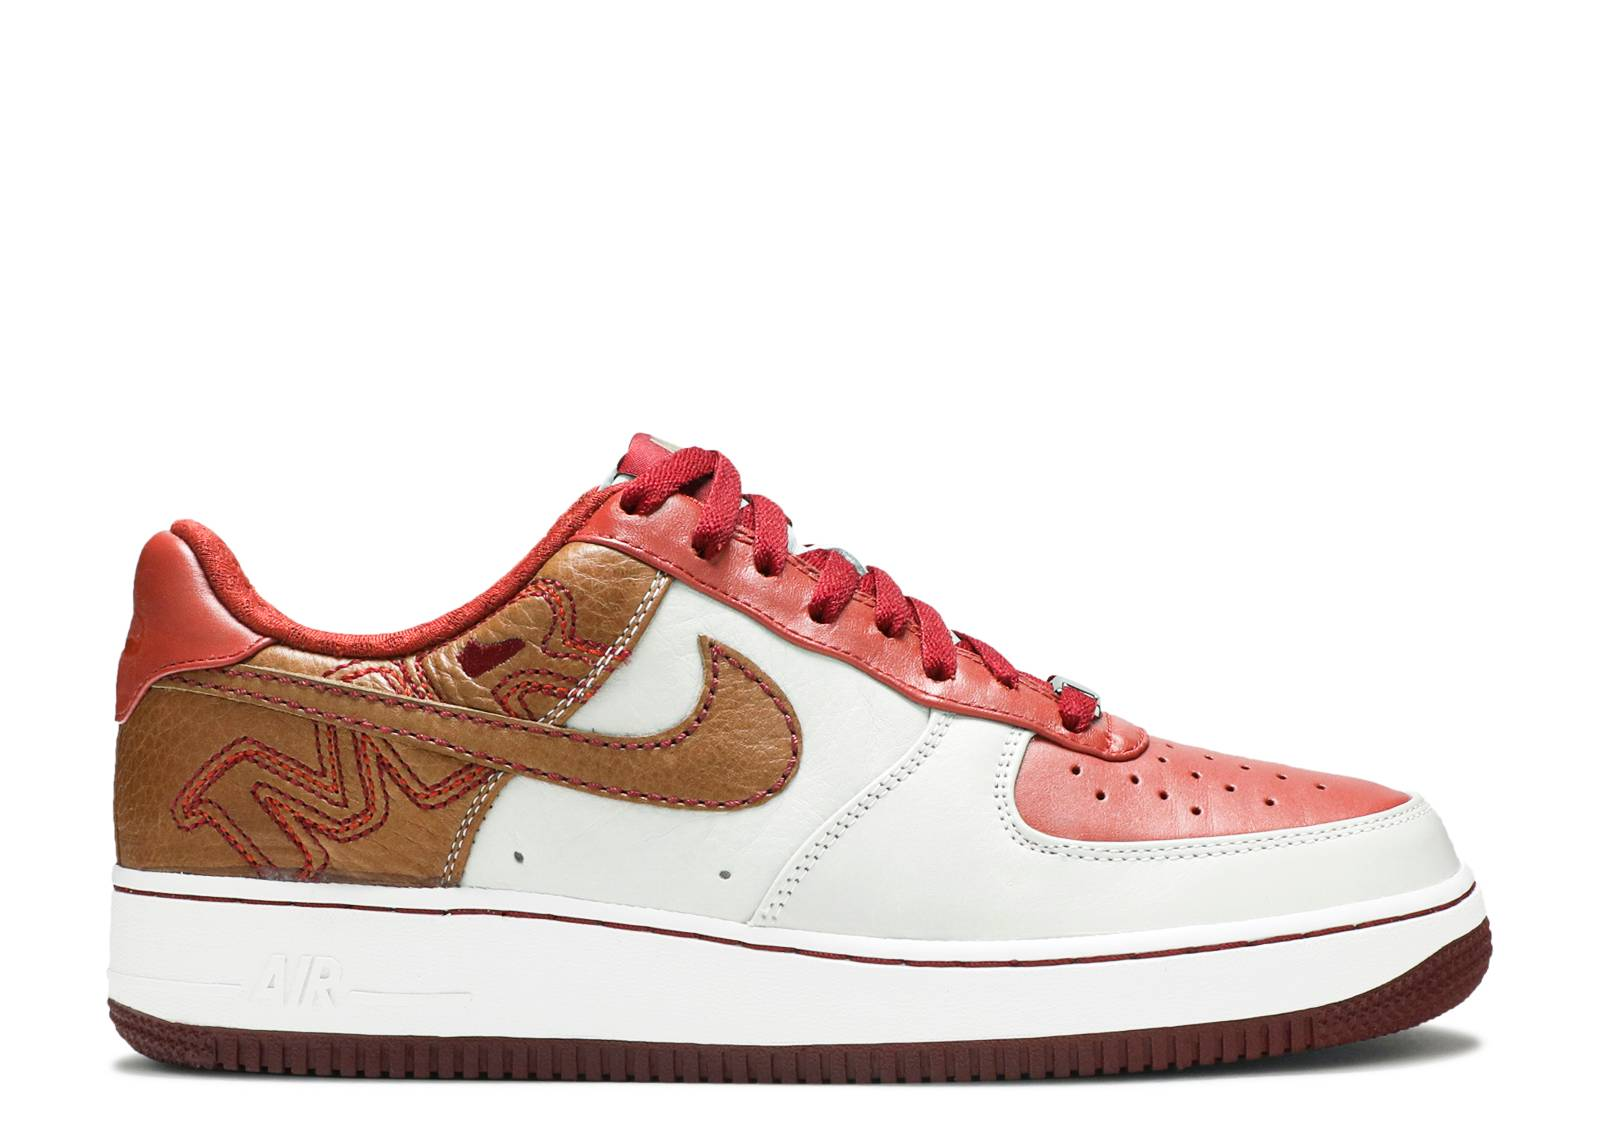 899c48c68656 Air Force 1 Premium 07 - Nike - 315180 121 - white pinenut-terra ...